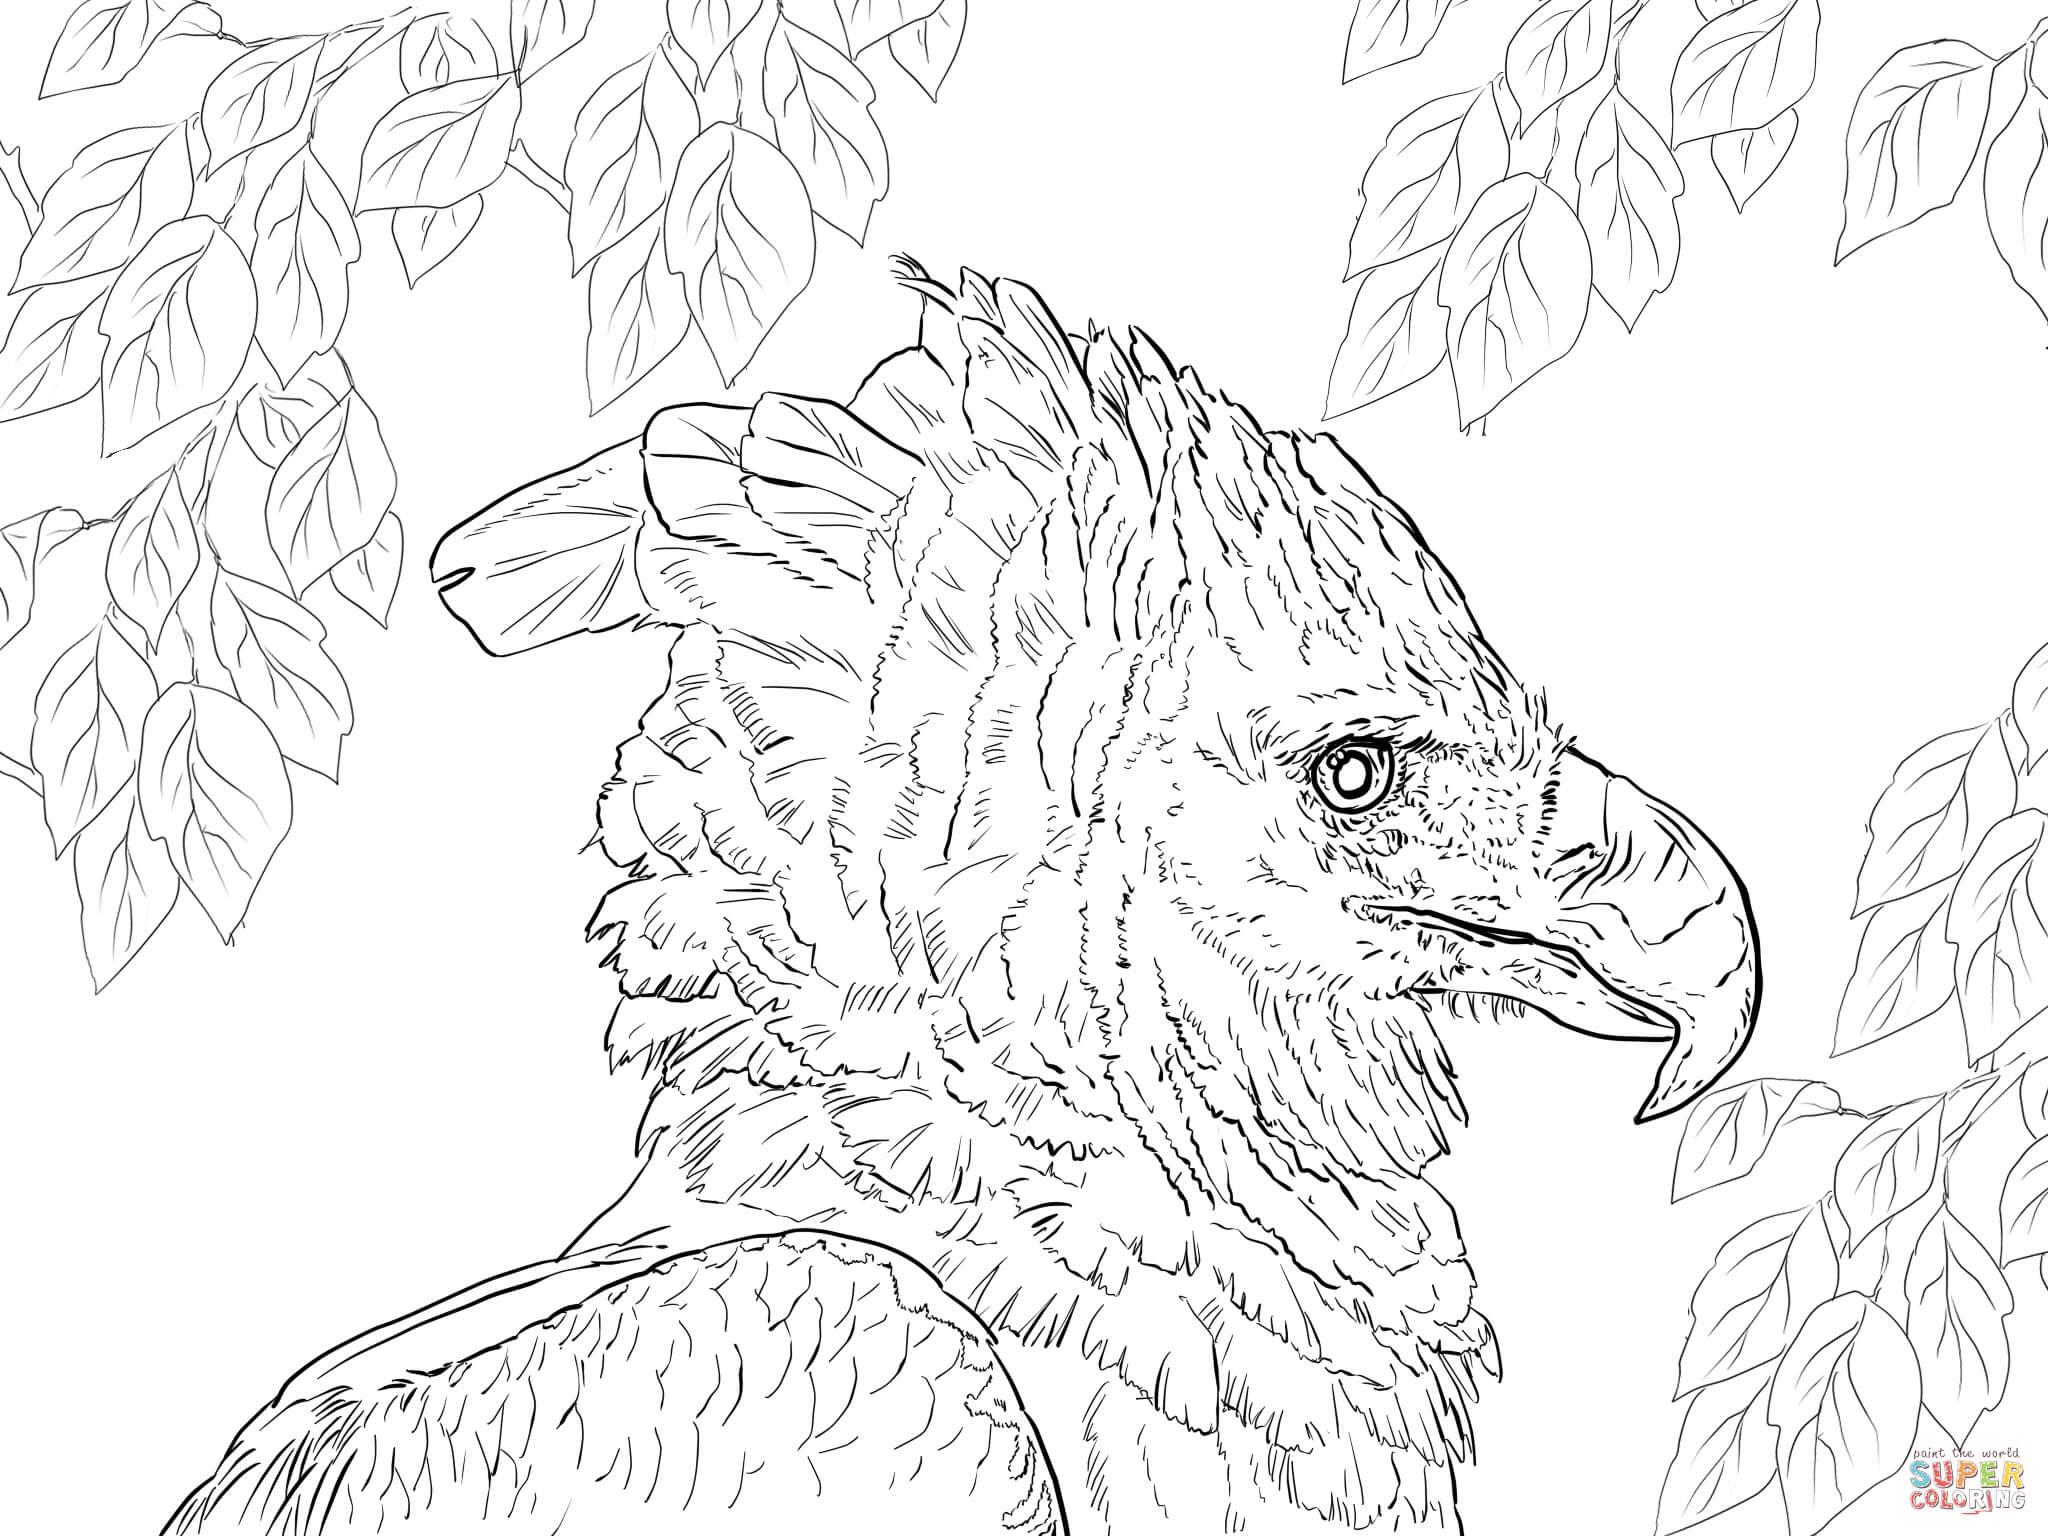 Harpyienadler im Profil